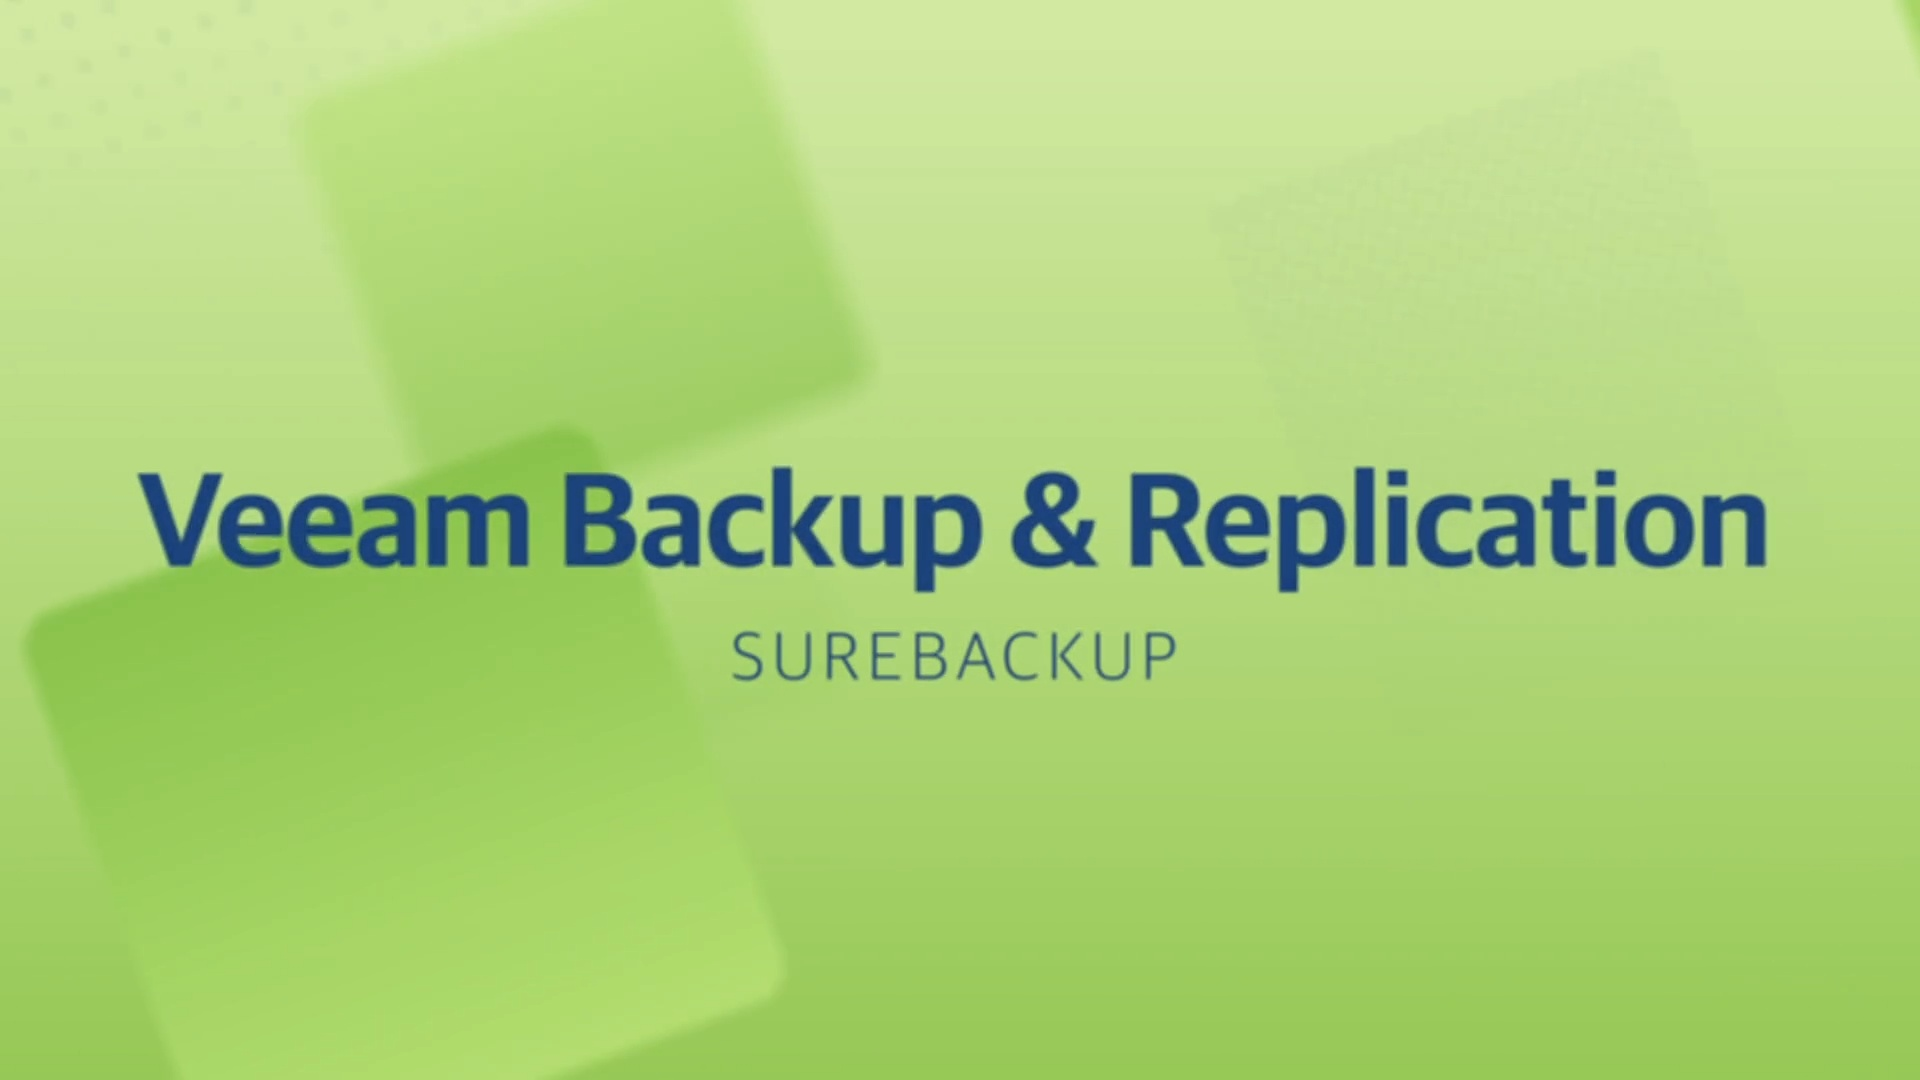 Product launch v11 - VBR - SureBackup